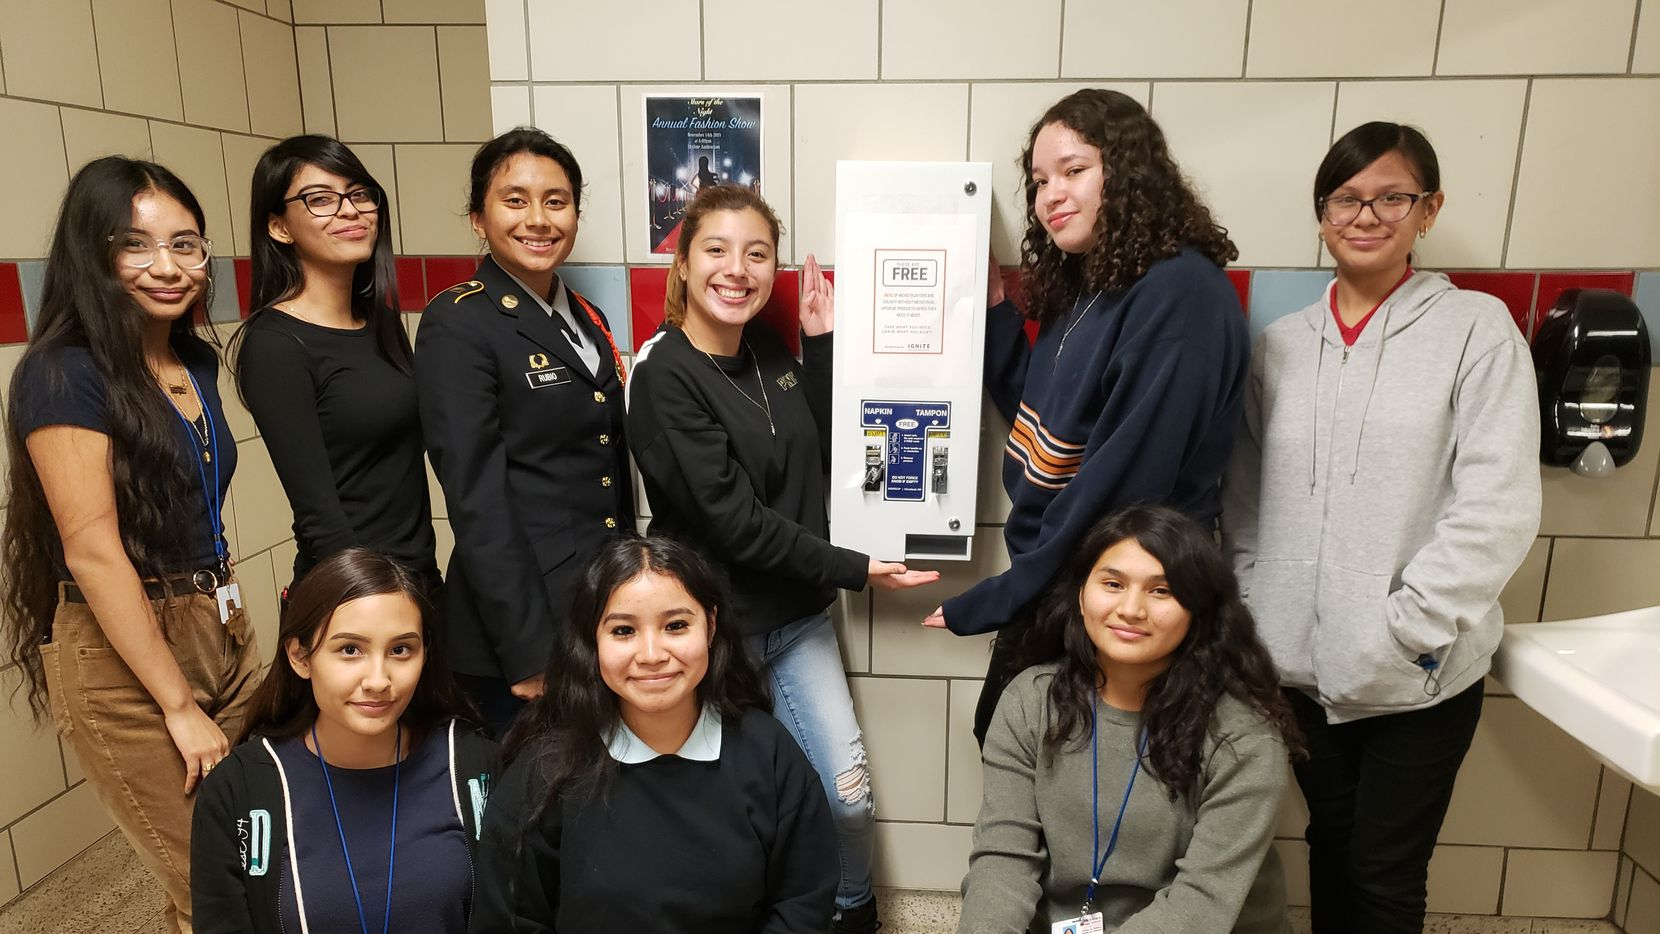 Members of Skyline High School's IGNITE club celebrate the installation of a feminine hygiene product dispenser in school's bathroom.